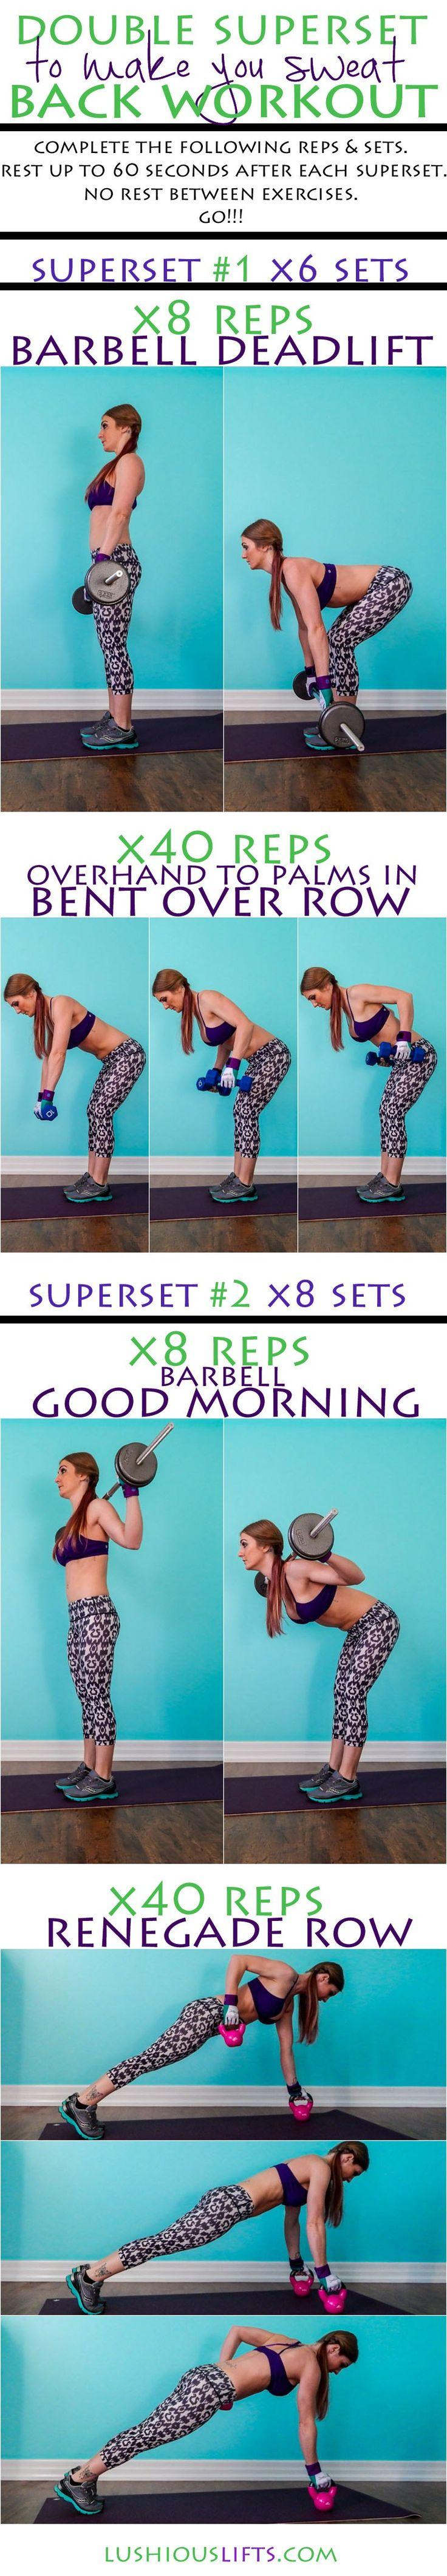 Double Superset {to make you sweat} Back Workout || lushiousLIFTS.com